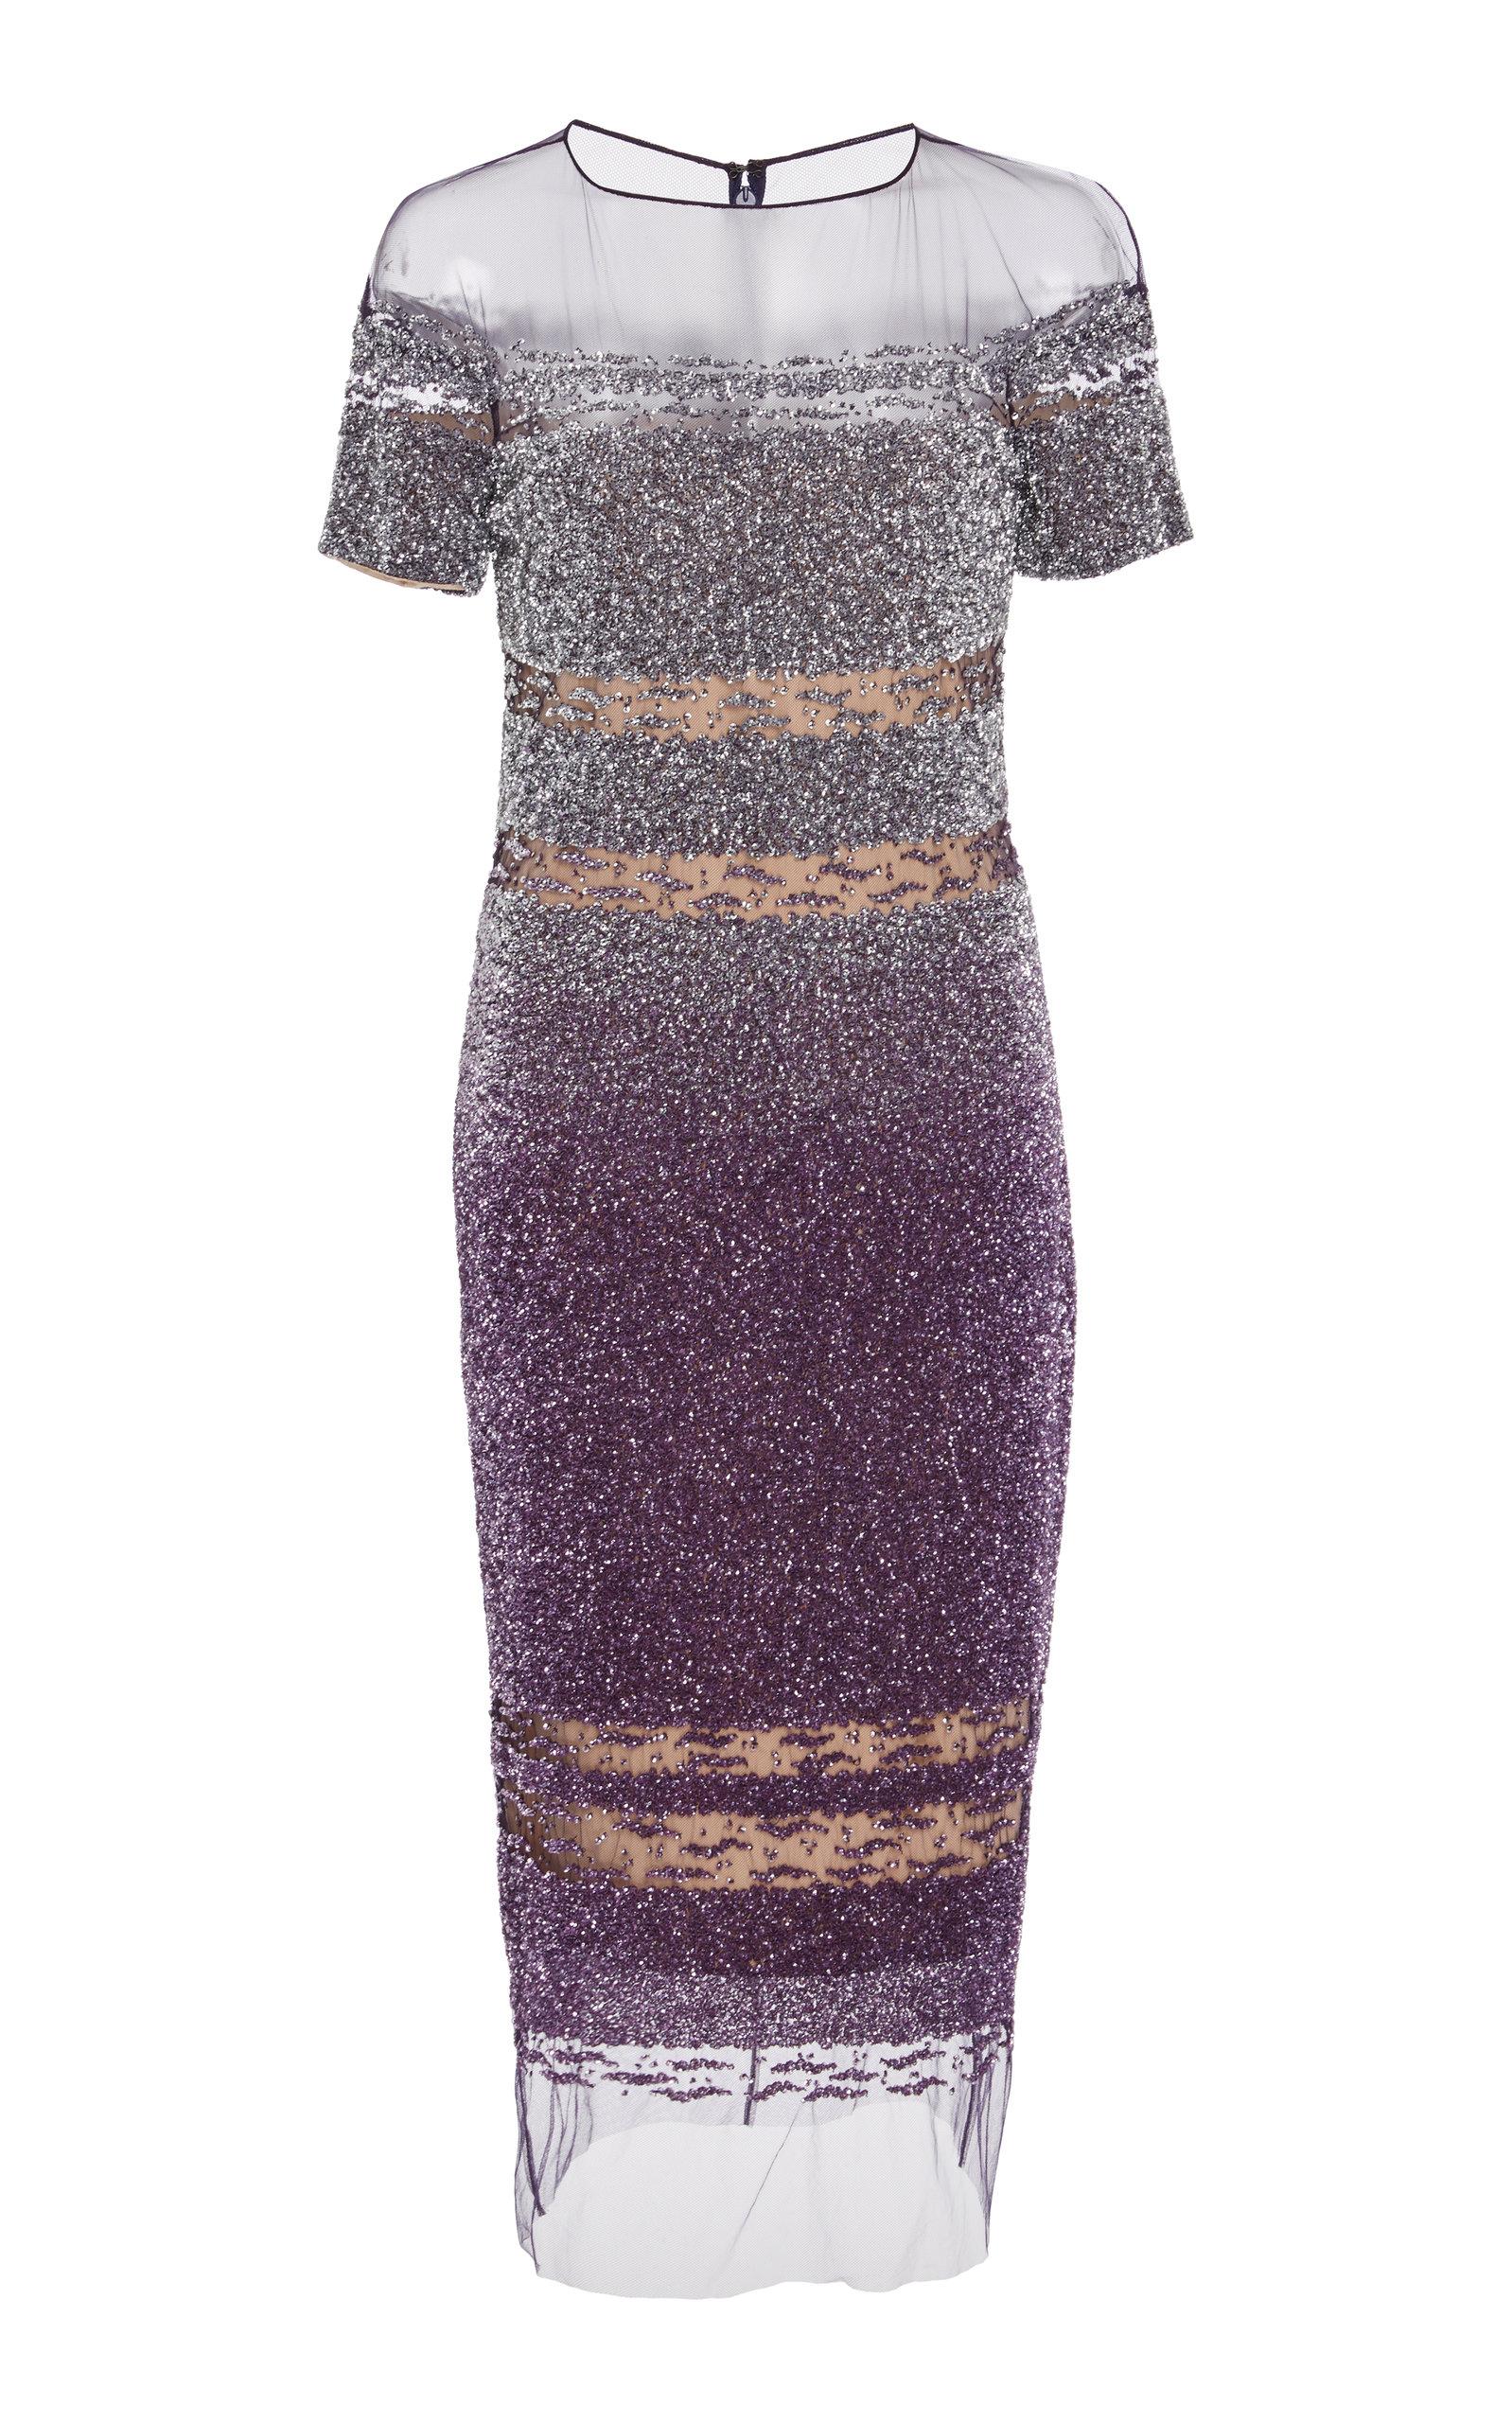 Signature Sequin Sheer Hem Dress by Pamella Roland | Moda Operandi